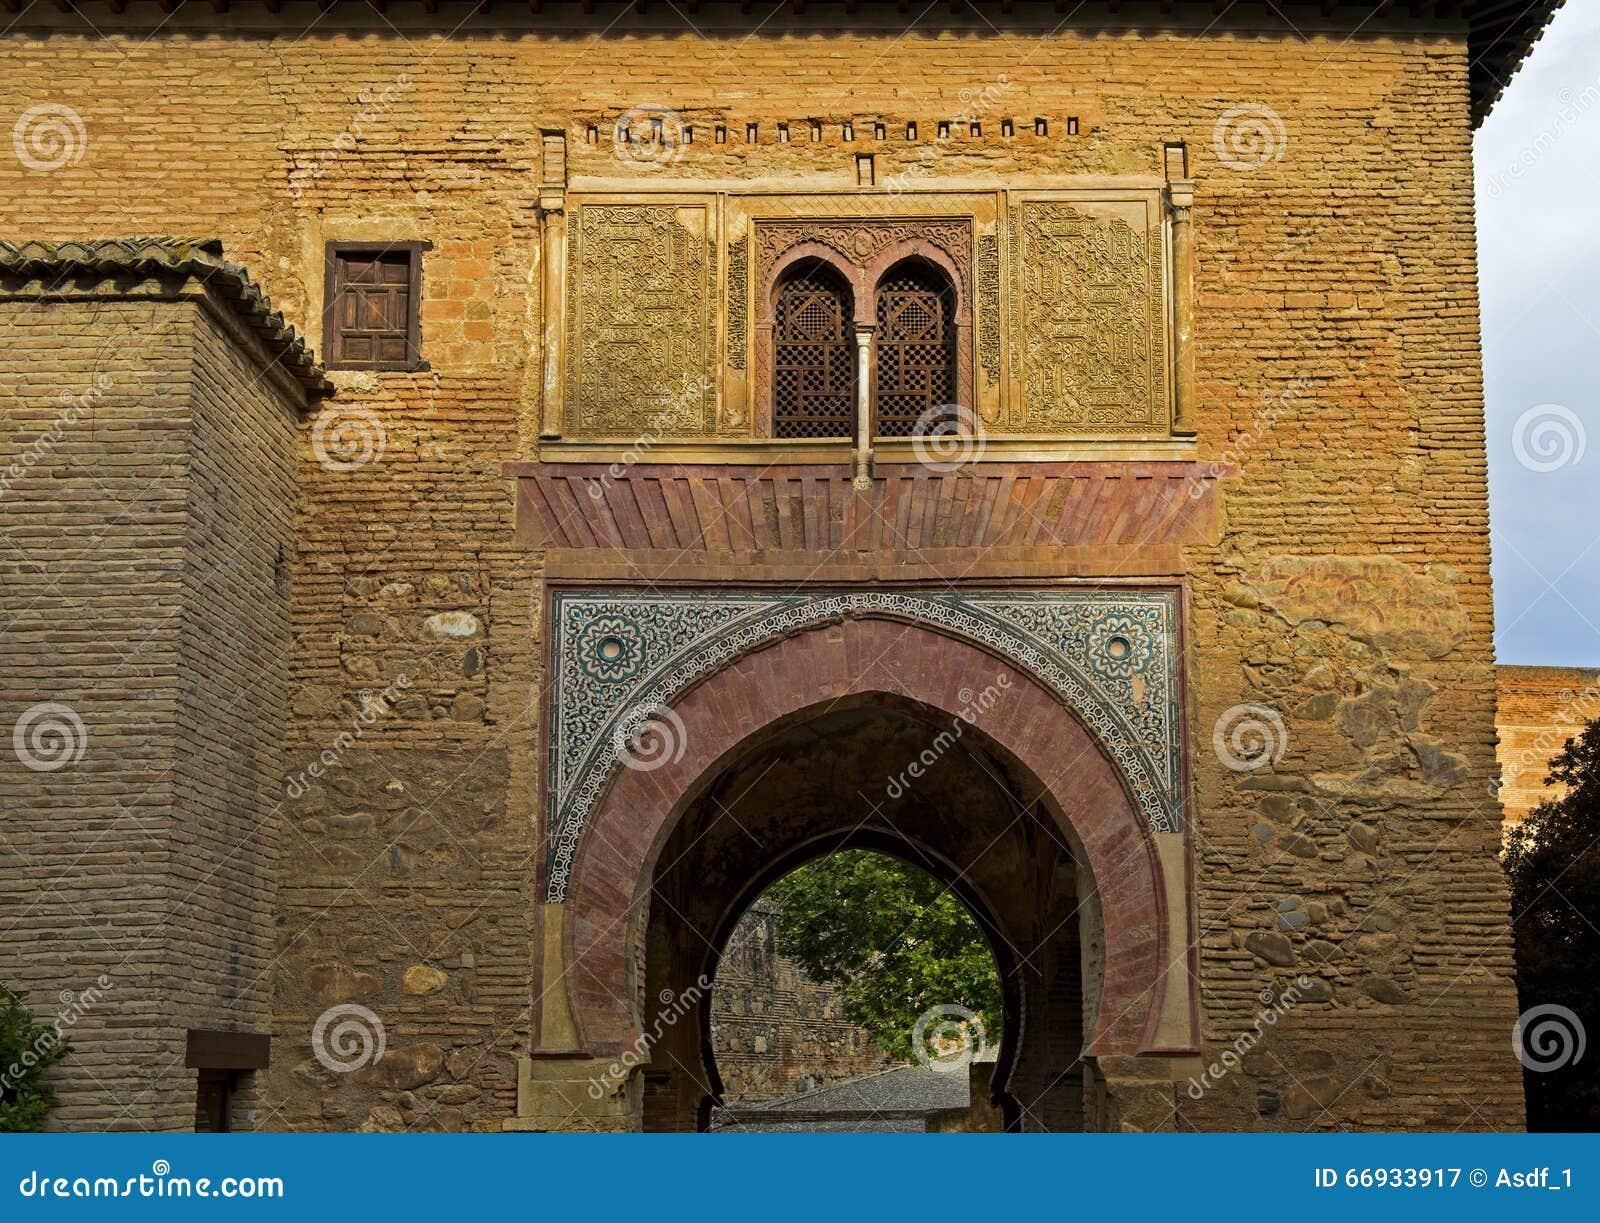 Wine Gate, Alhambra, Granada, Spain